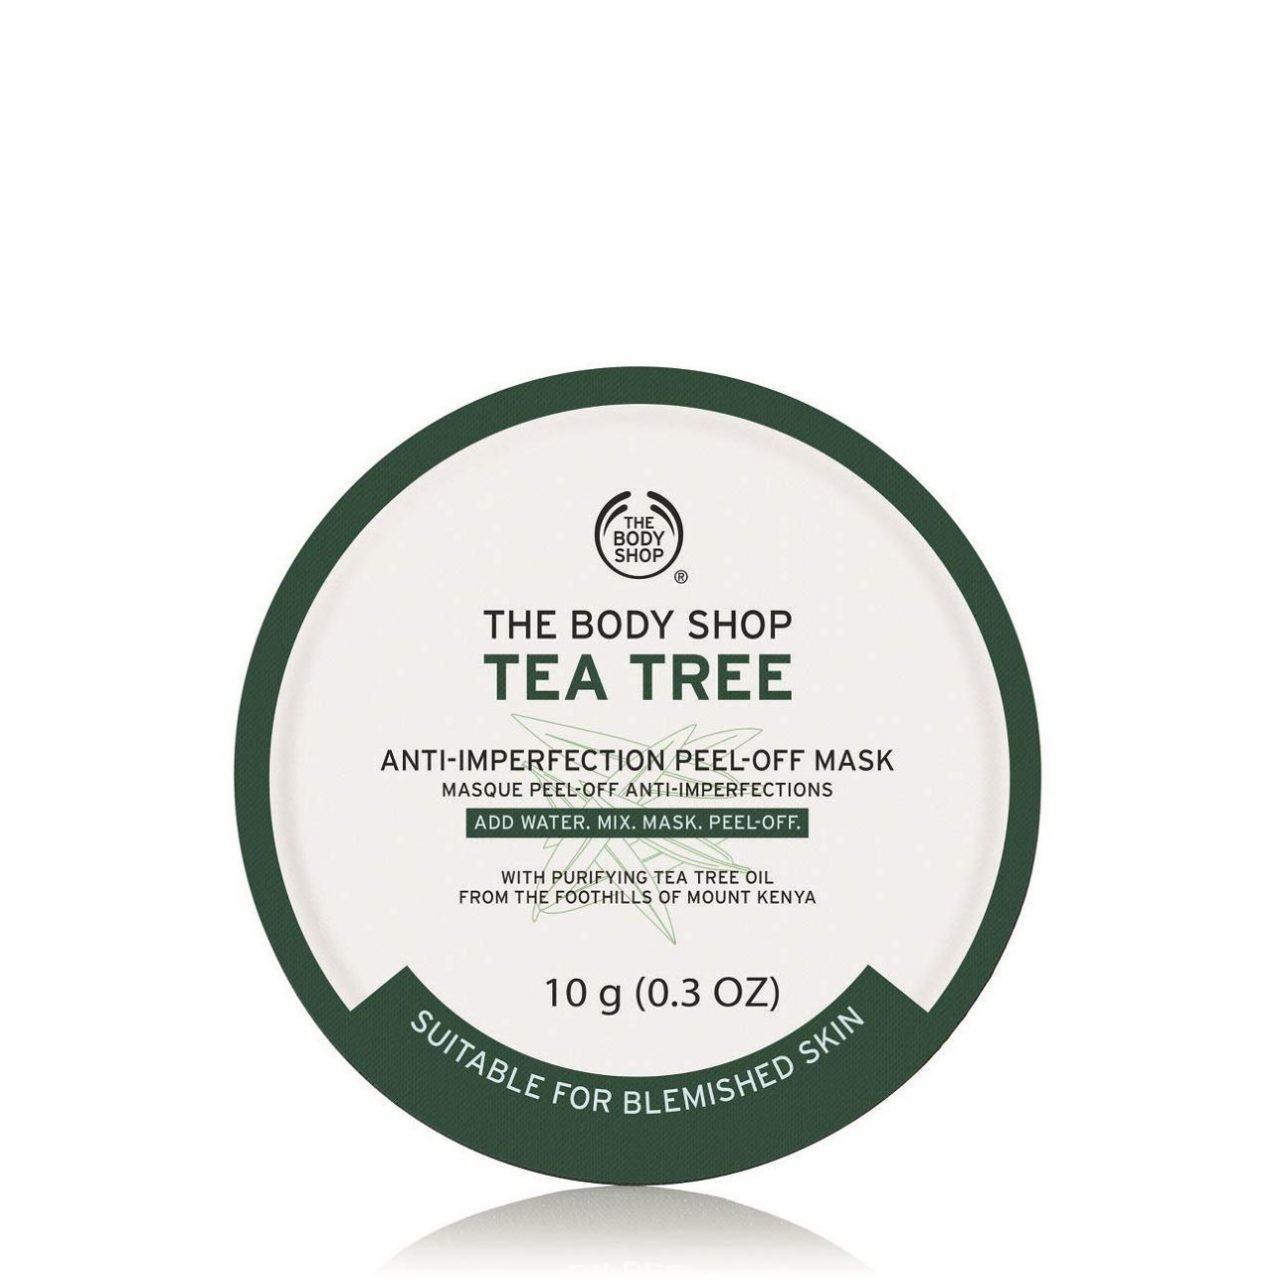 The Body Shop Tea Tree Peel Off Mask 10g